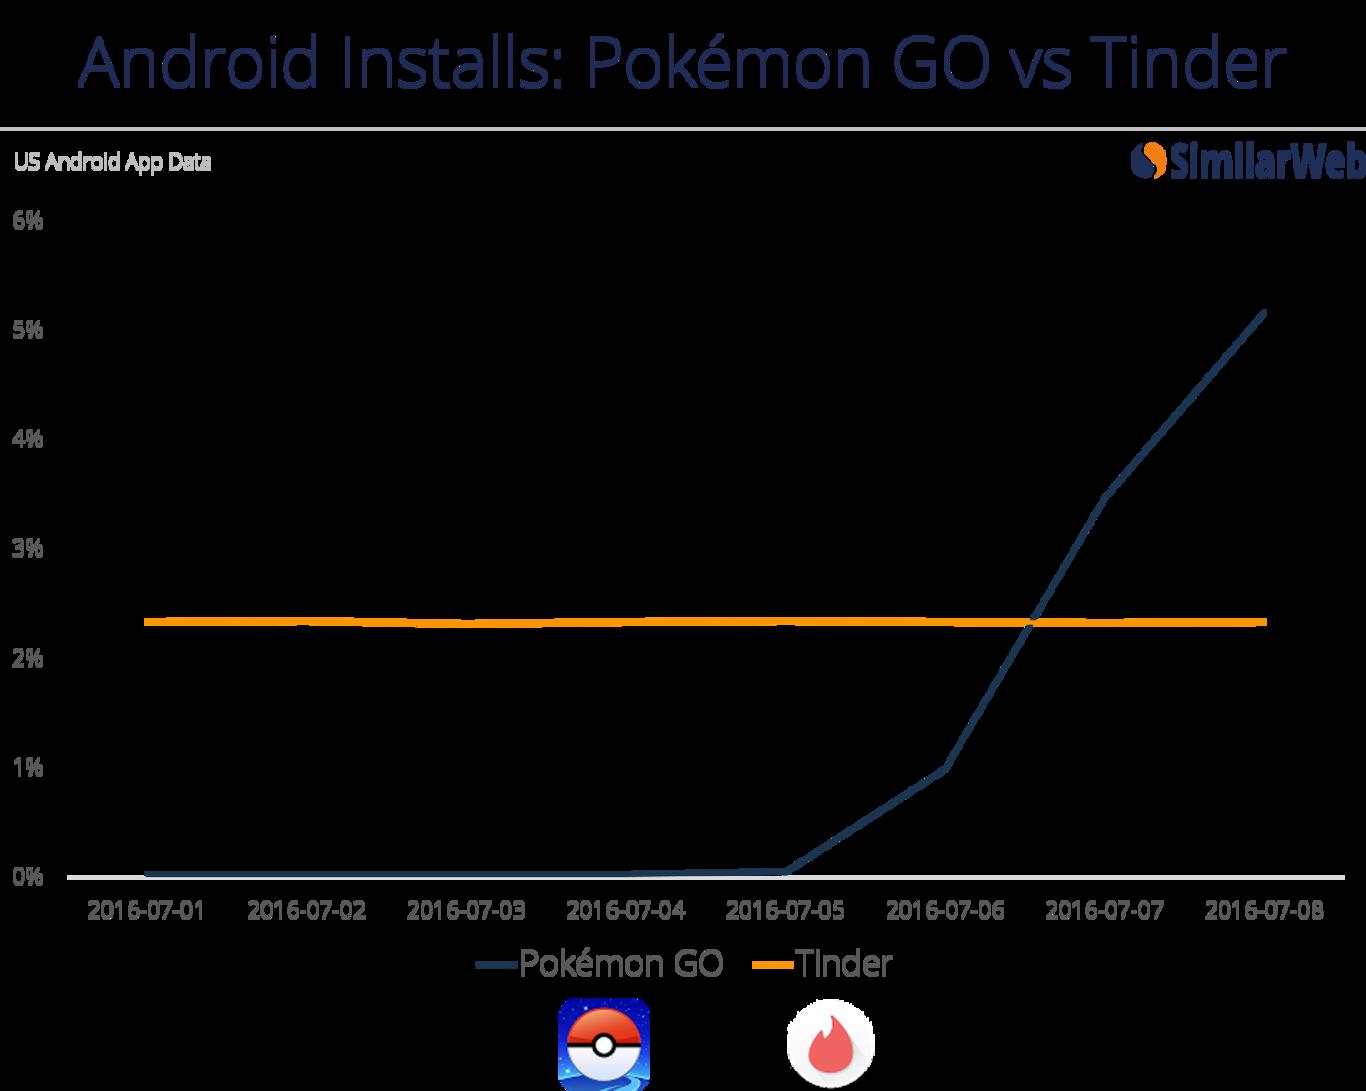 Descargas en android: Tinder vs Pokemon Go